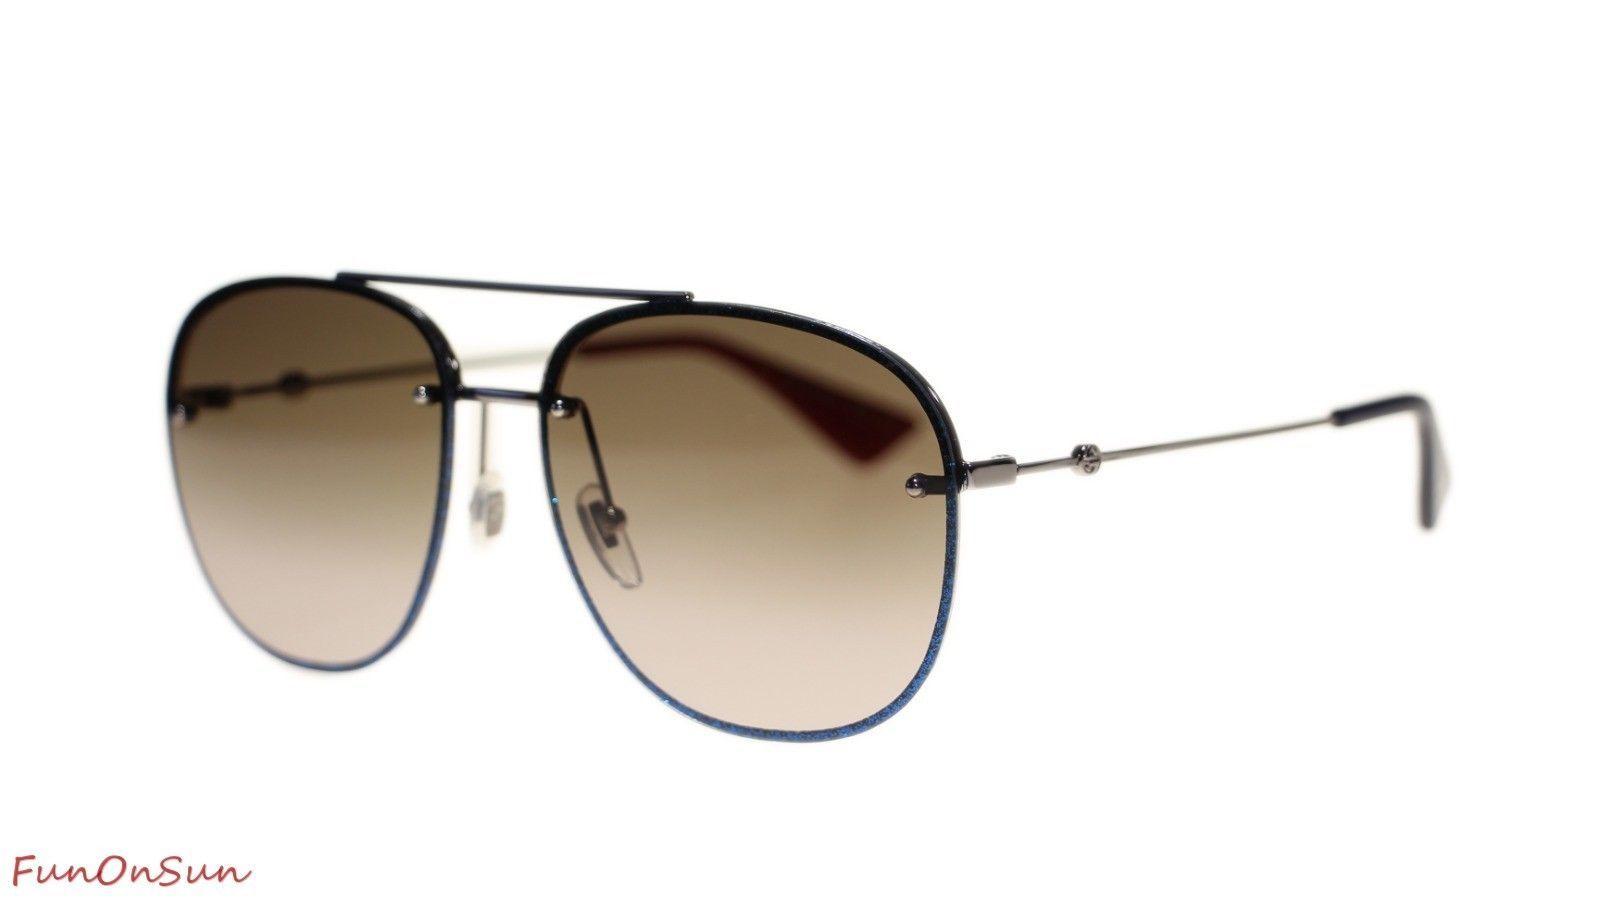 61e7c37d09 10. 10. Previous. Gucci Women Sunglasses GG0228S 001 Gold Green Gradient Lens  63mm Authentic. Gucci Women Sunglasses GG0228S ...